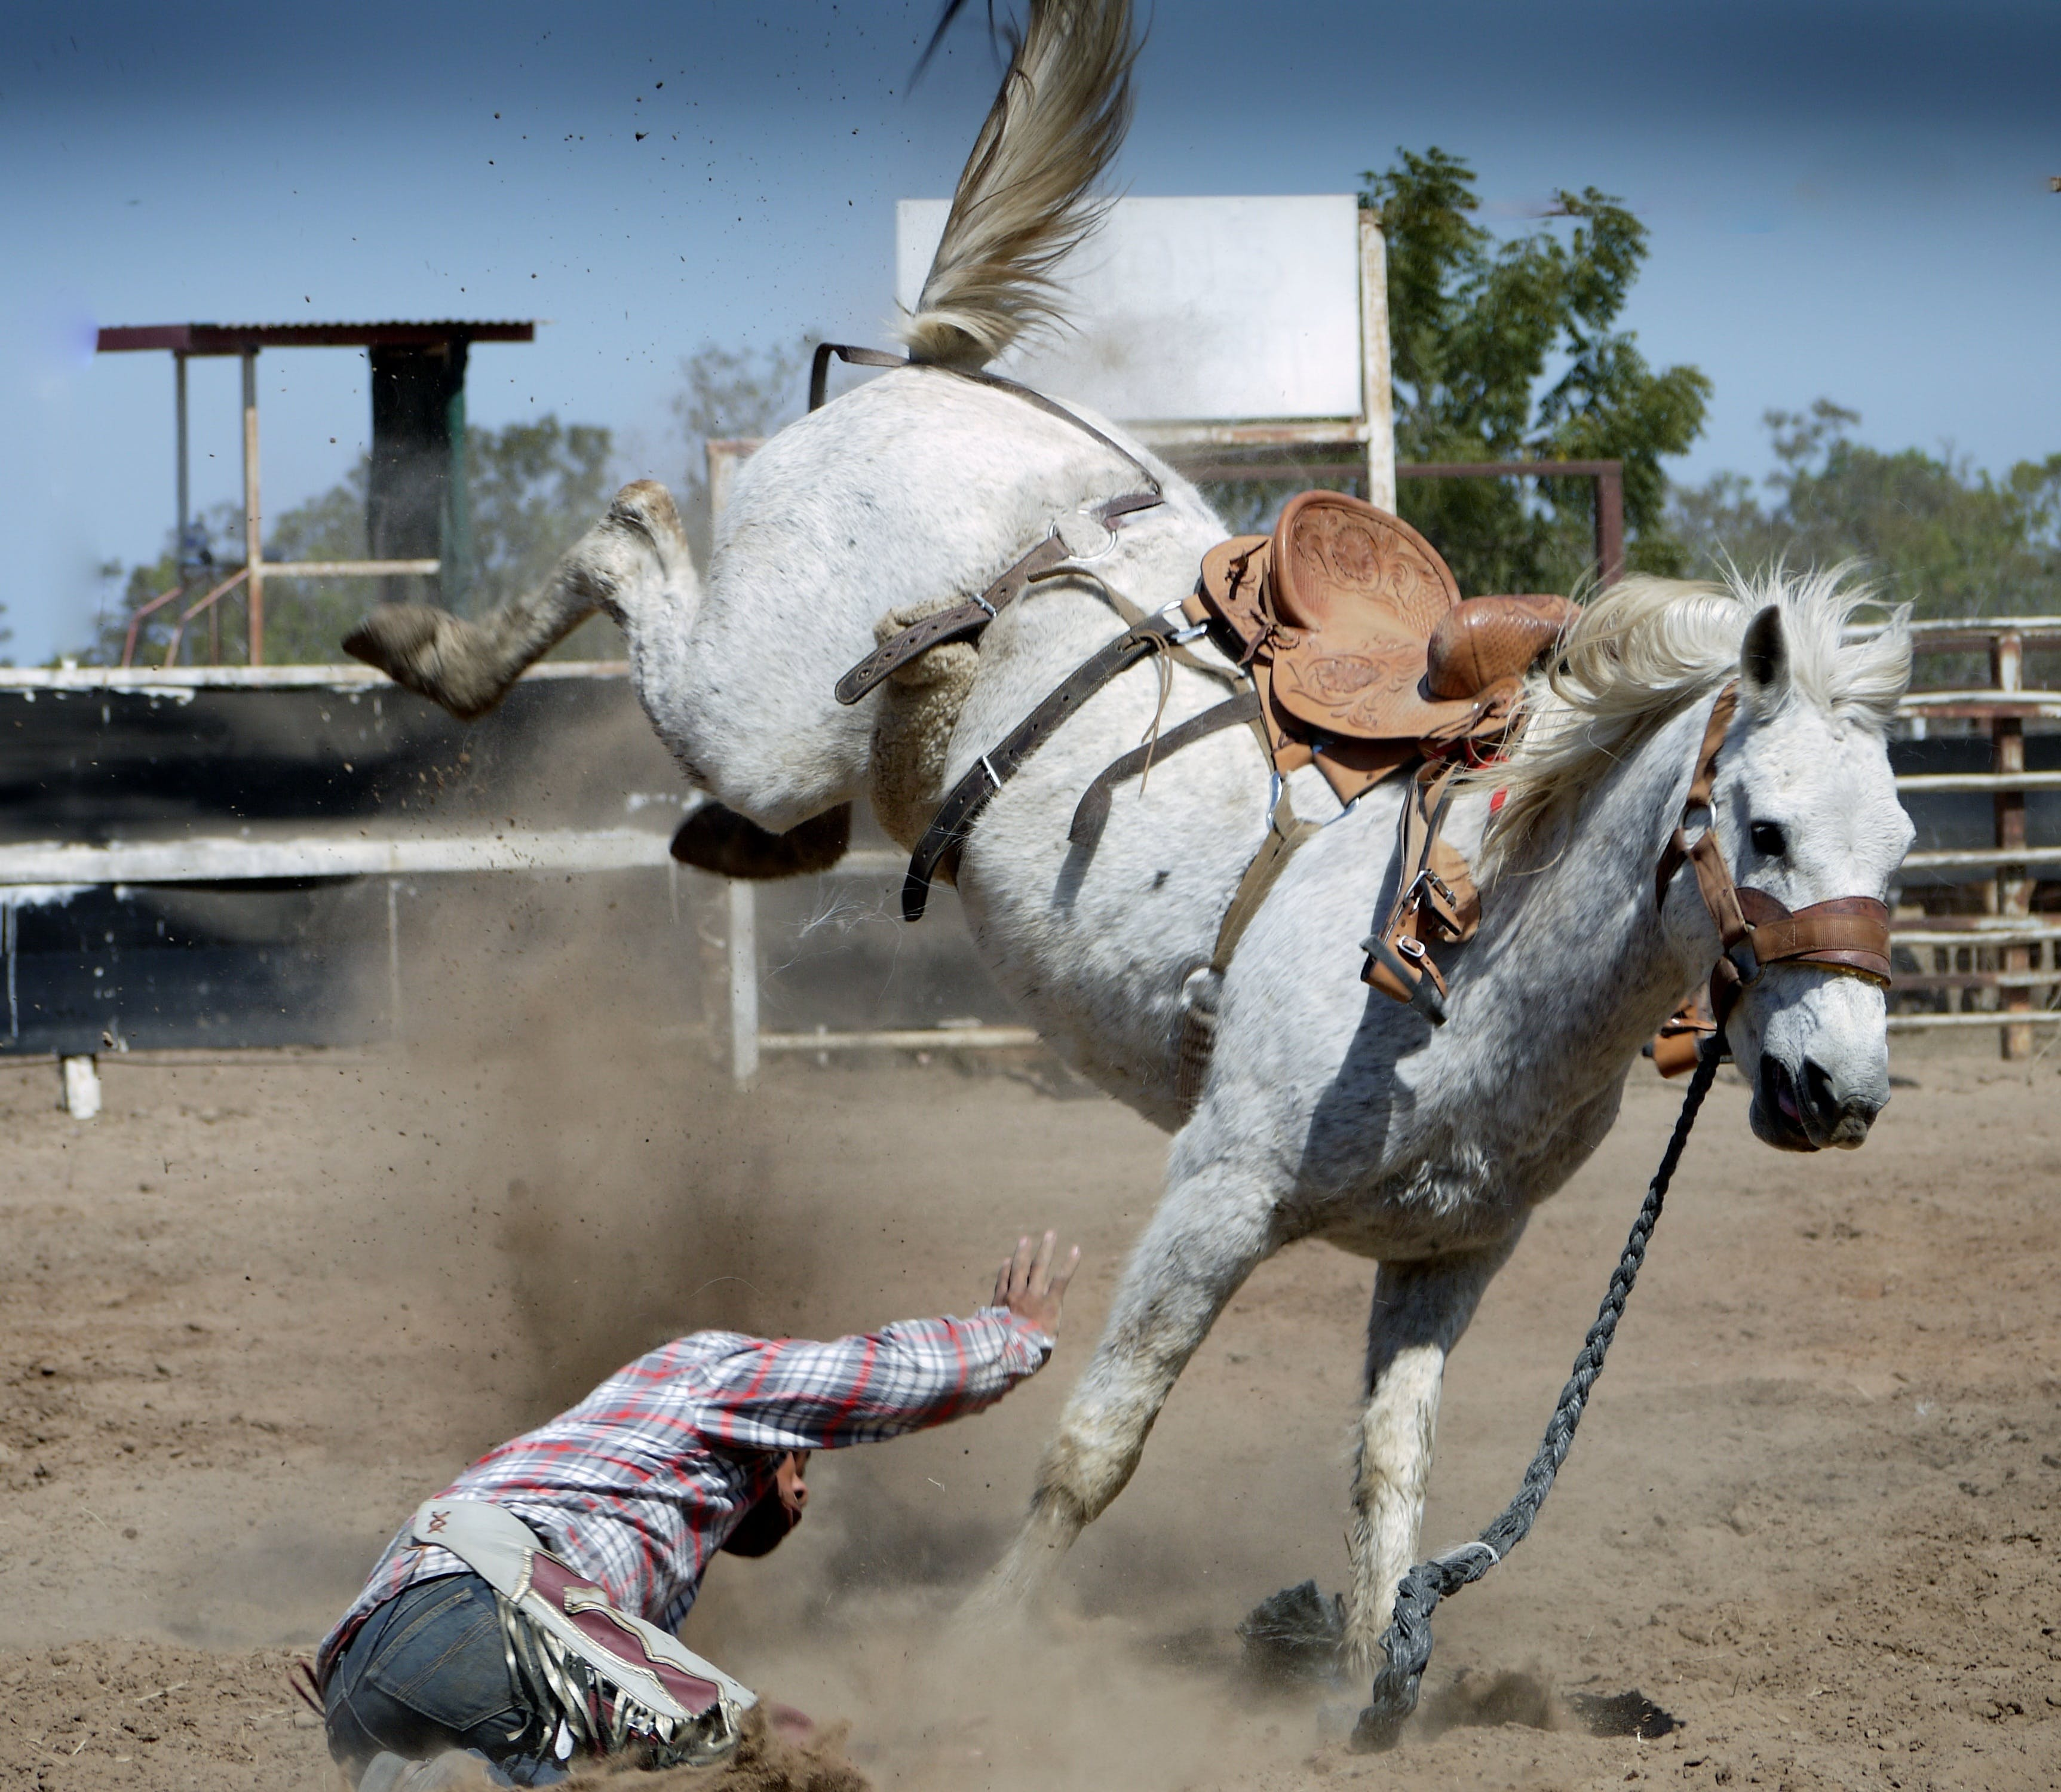 White Horse Kicking While Man on Ground